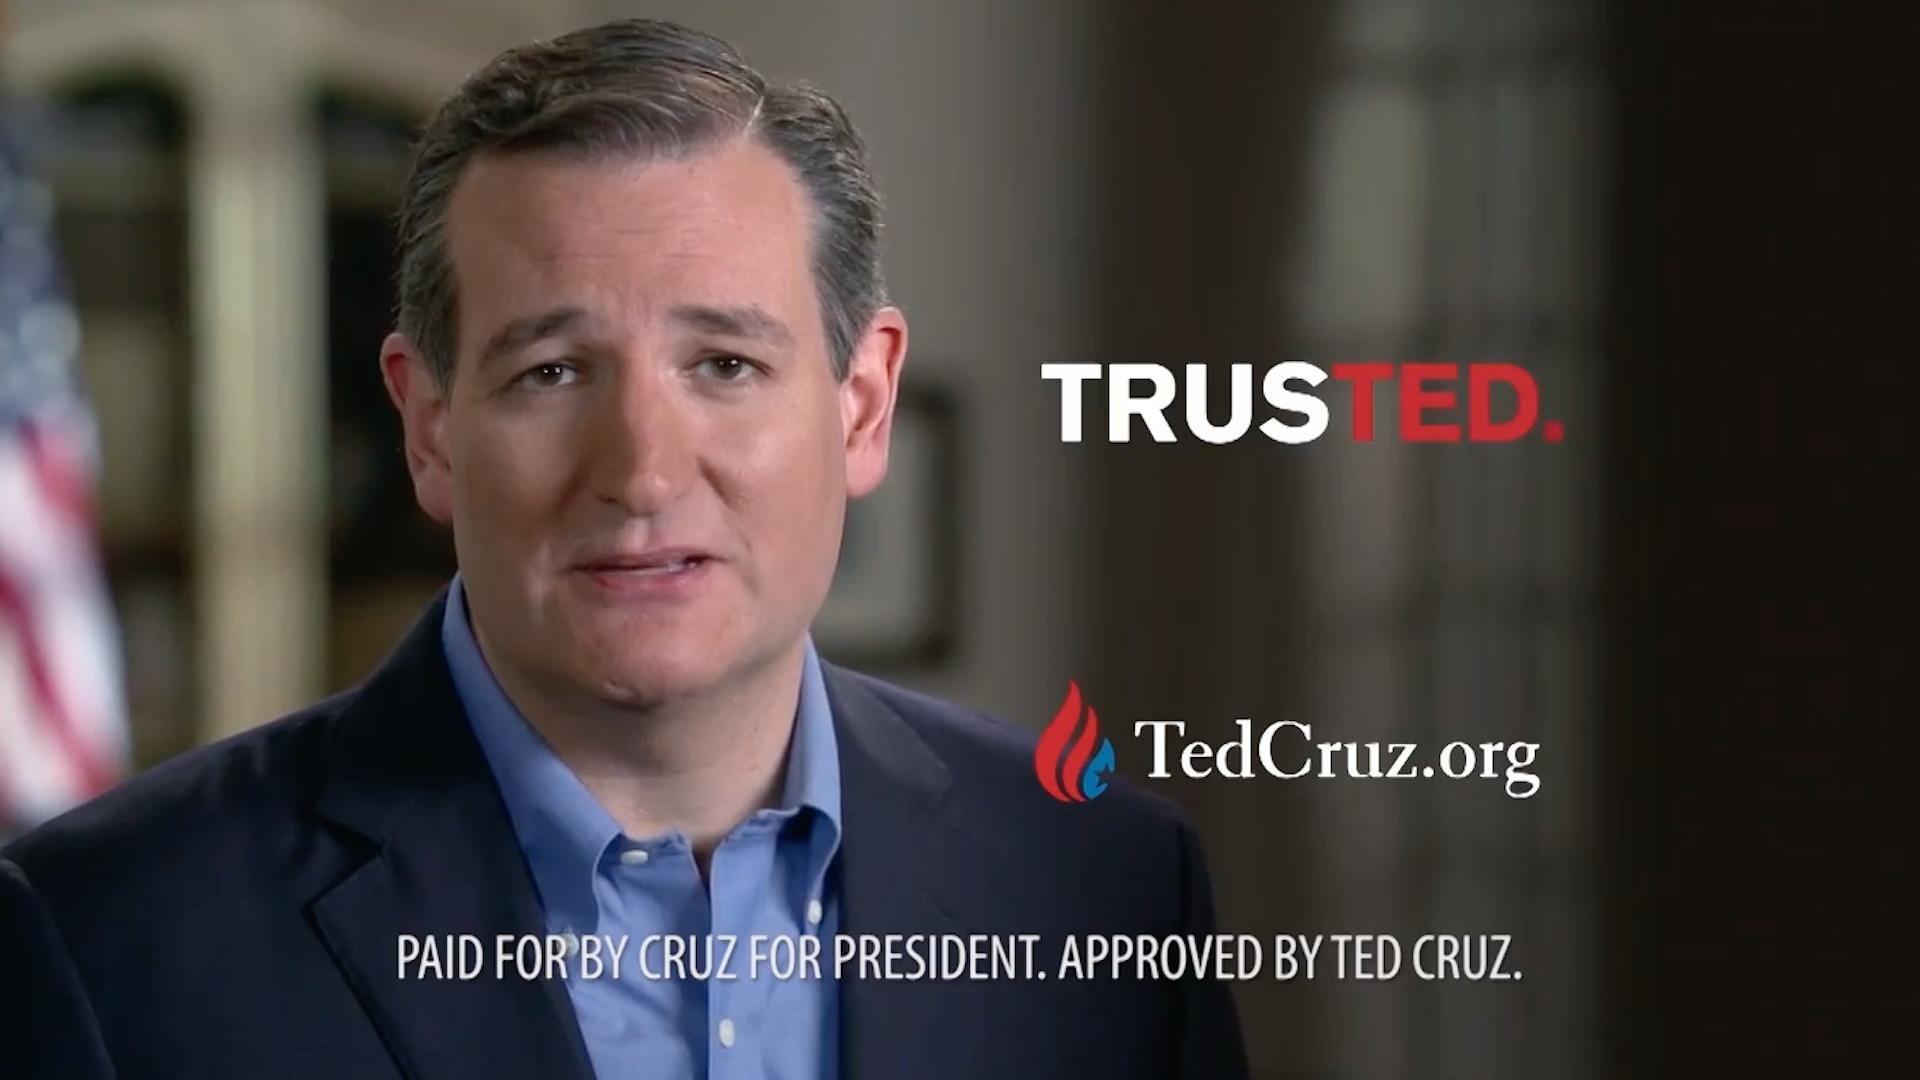 Cruz kills campaign ad featuring former softcore porn star